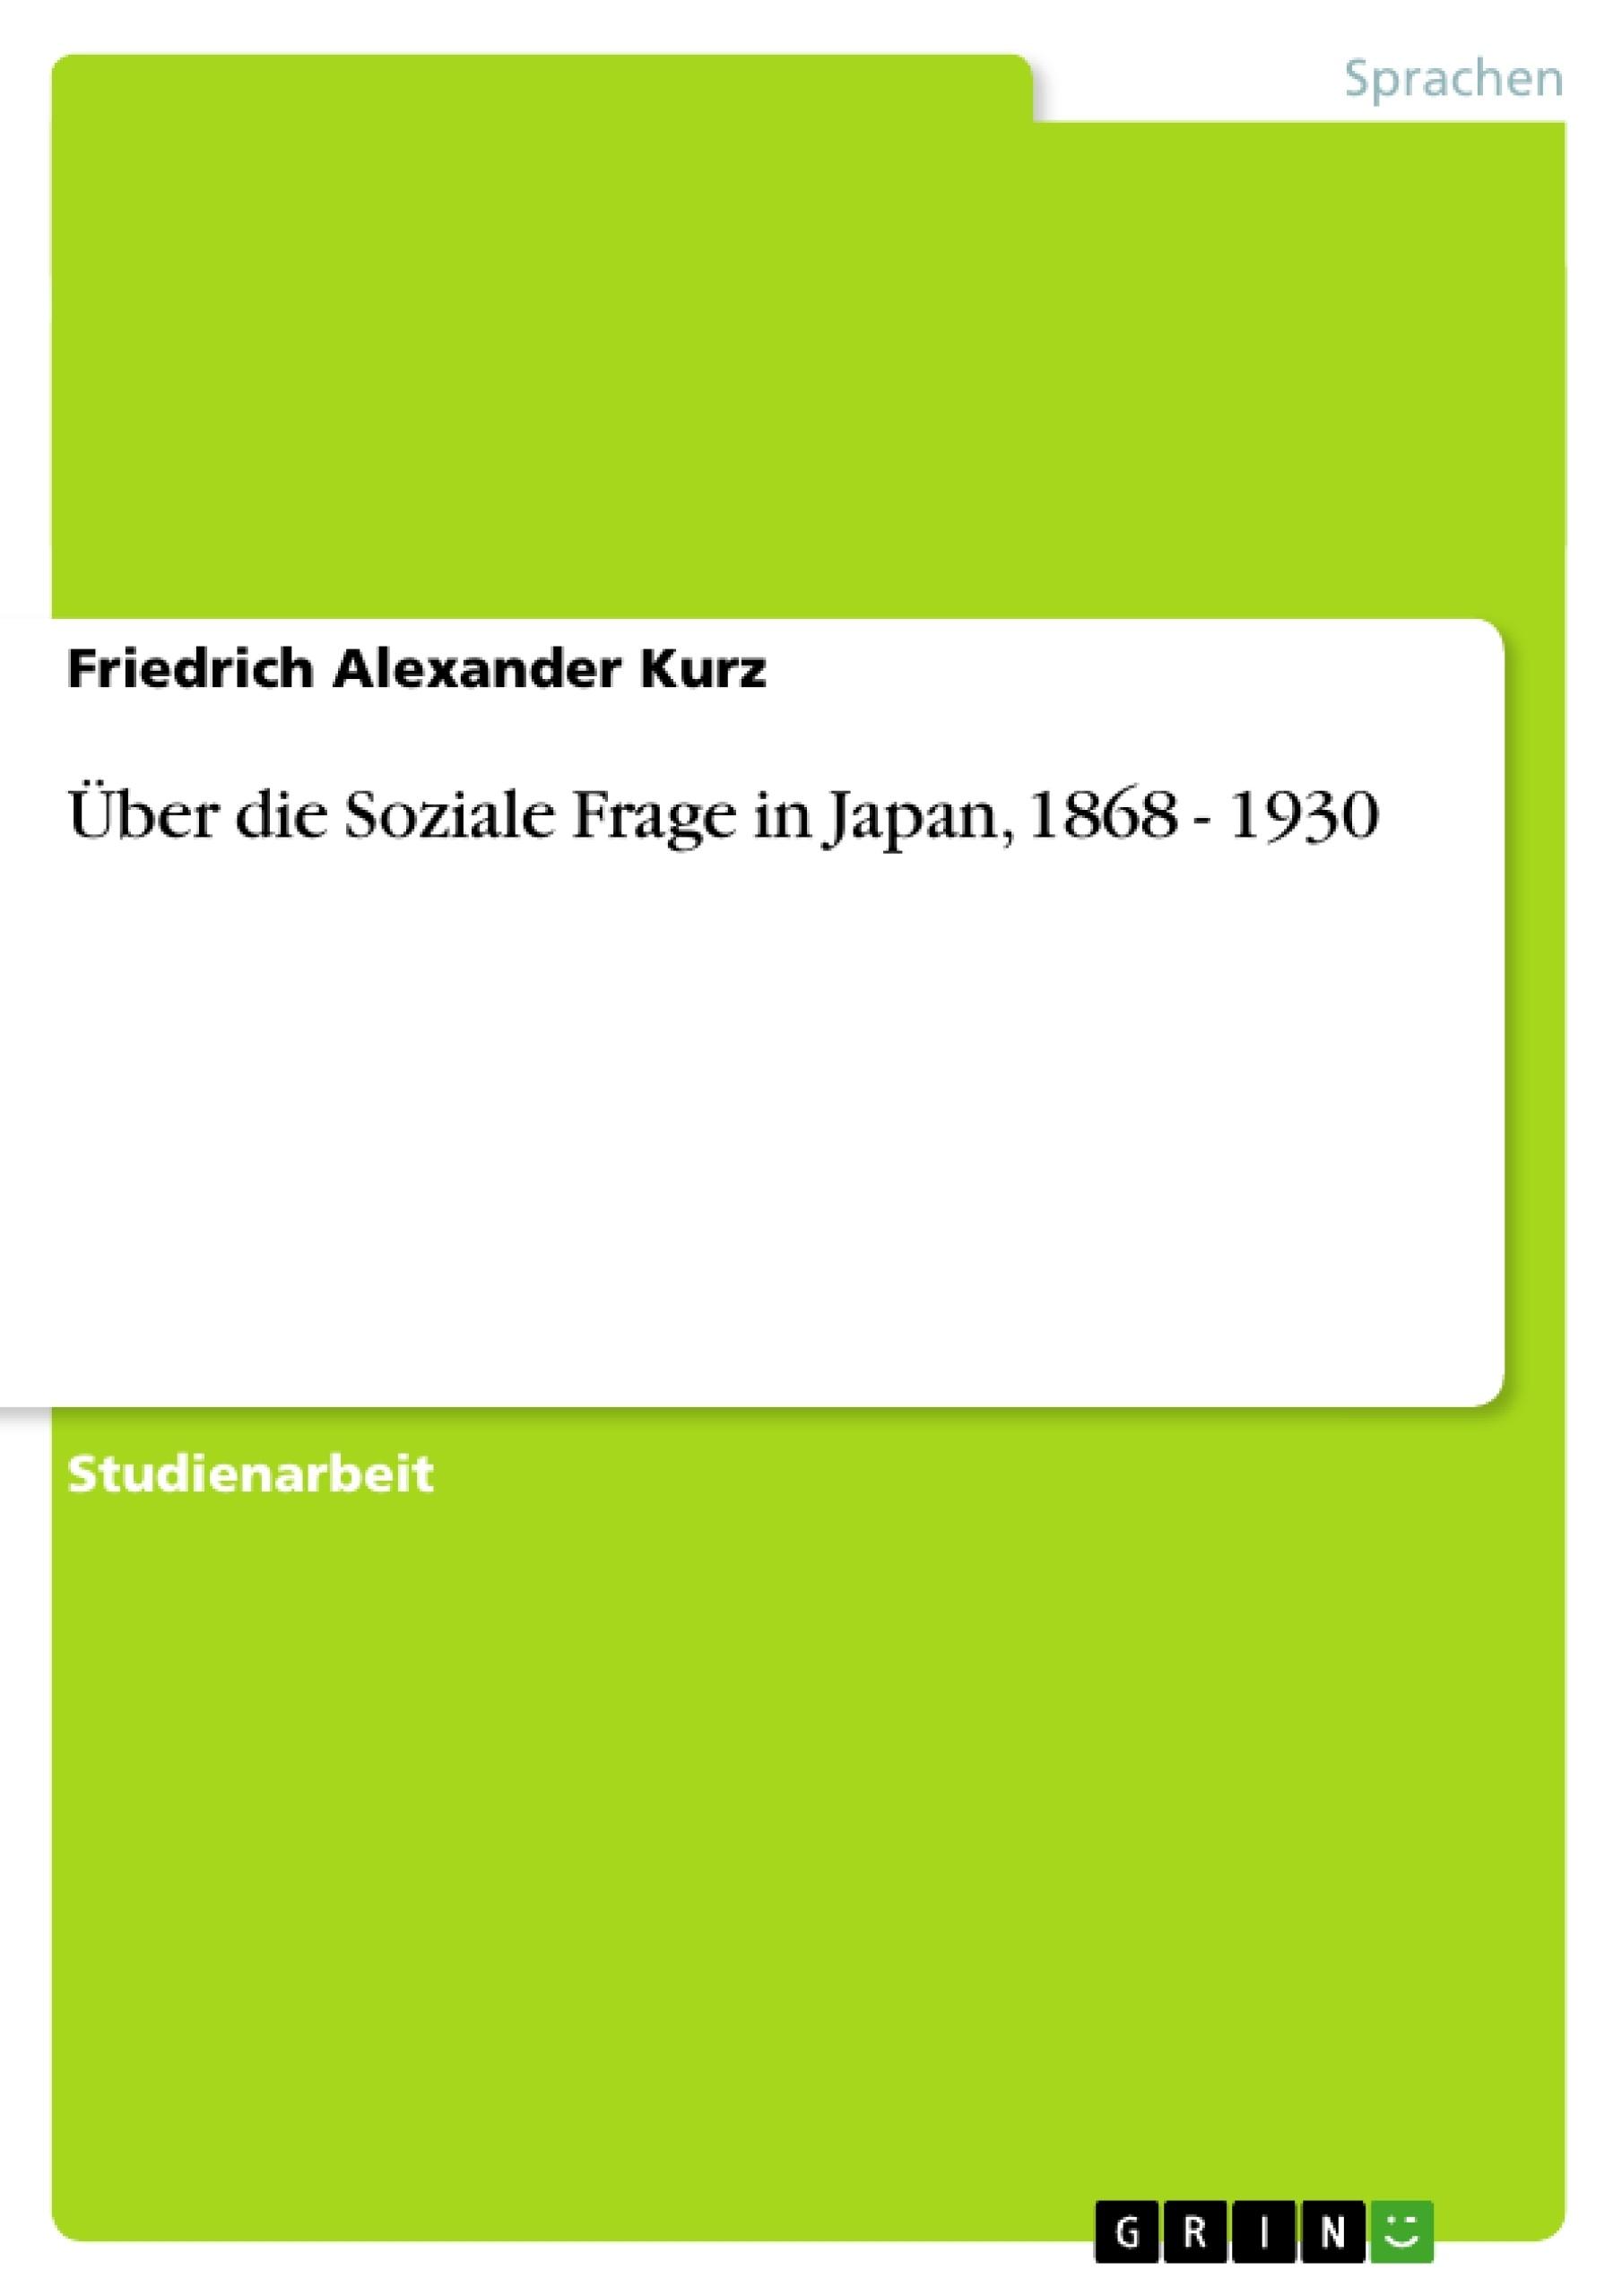 Titel: Über die Soziale Frage in Japan, 1868 - 1930